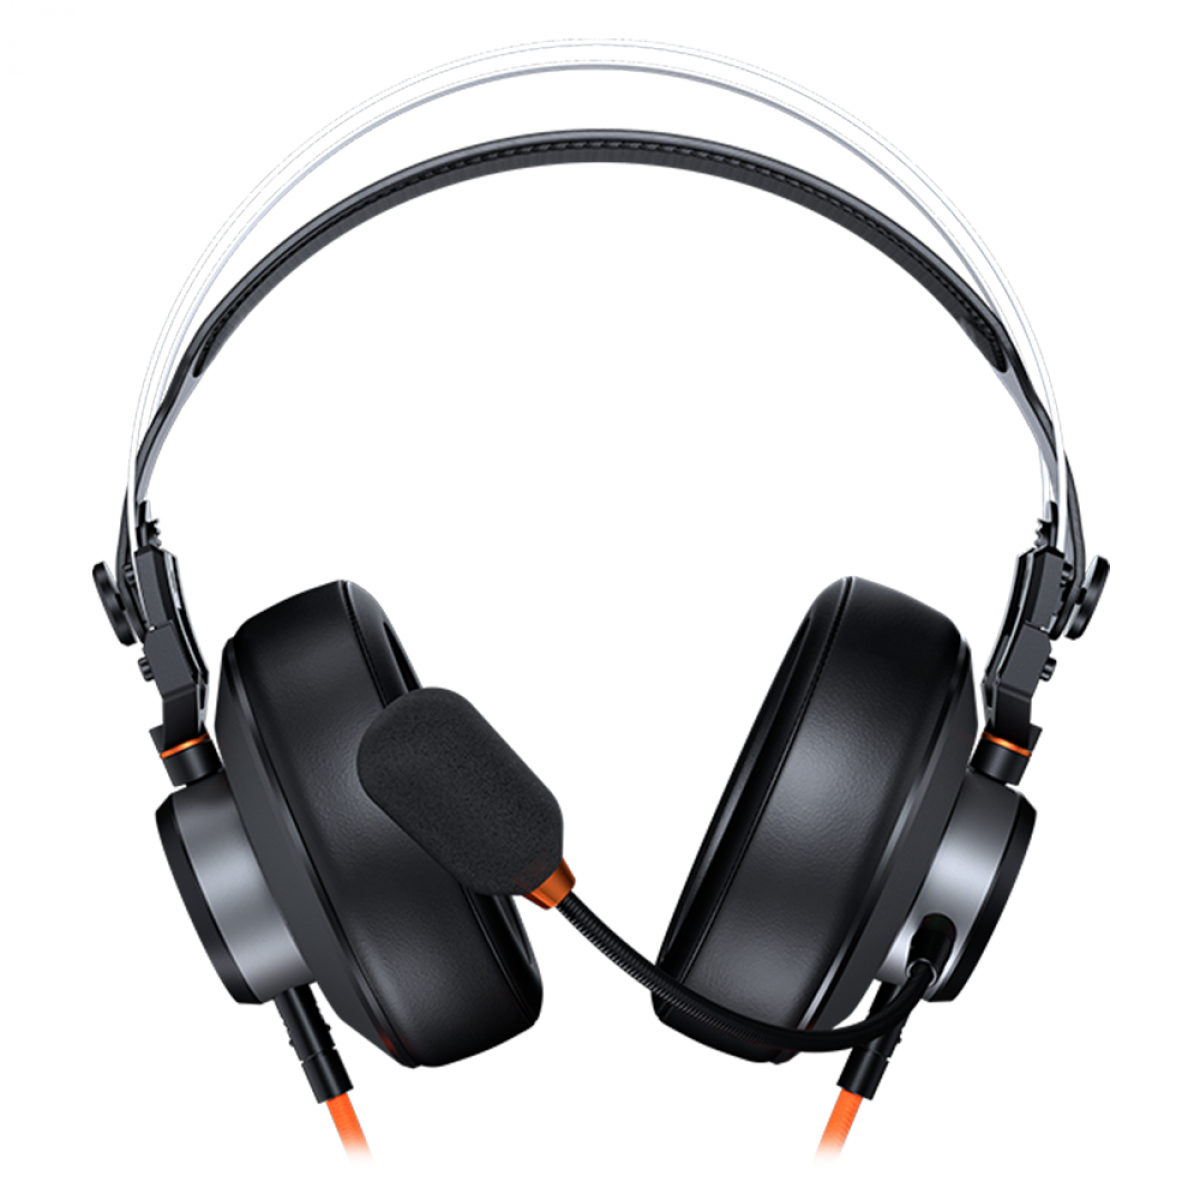 Headset Gamer Cougar VM410 Tournament, 3.5mm, Multi Plataforma, Black/Orange, 3H550P53O.0002